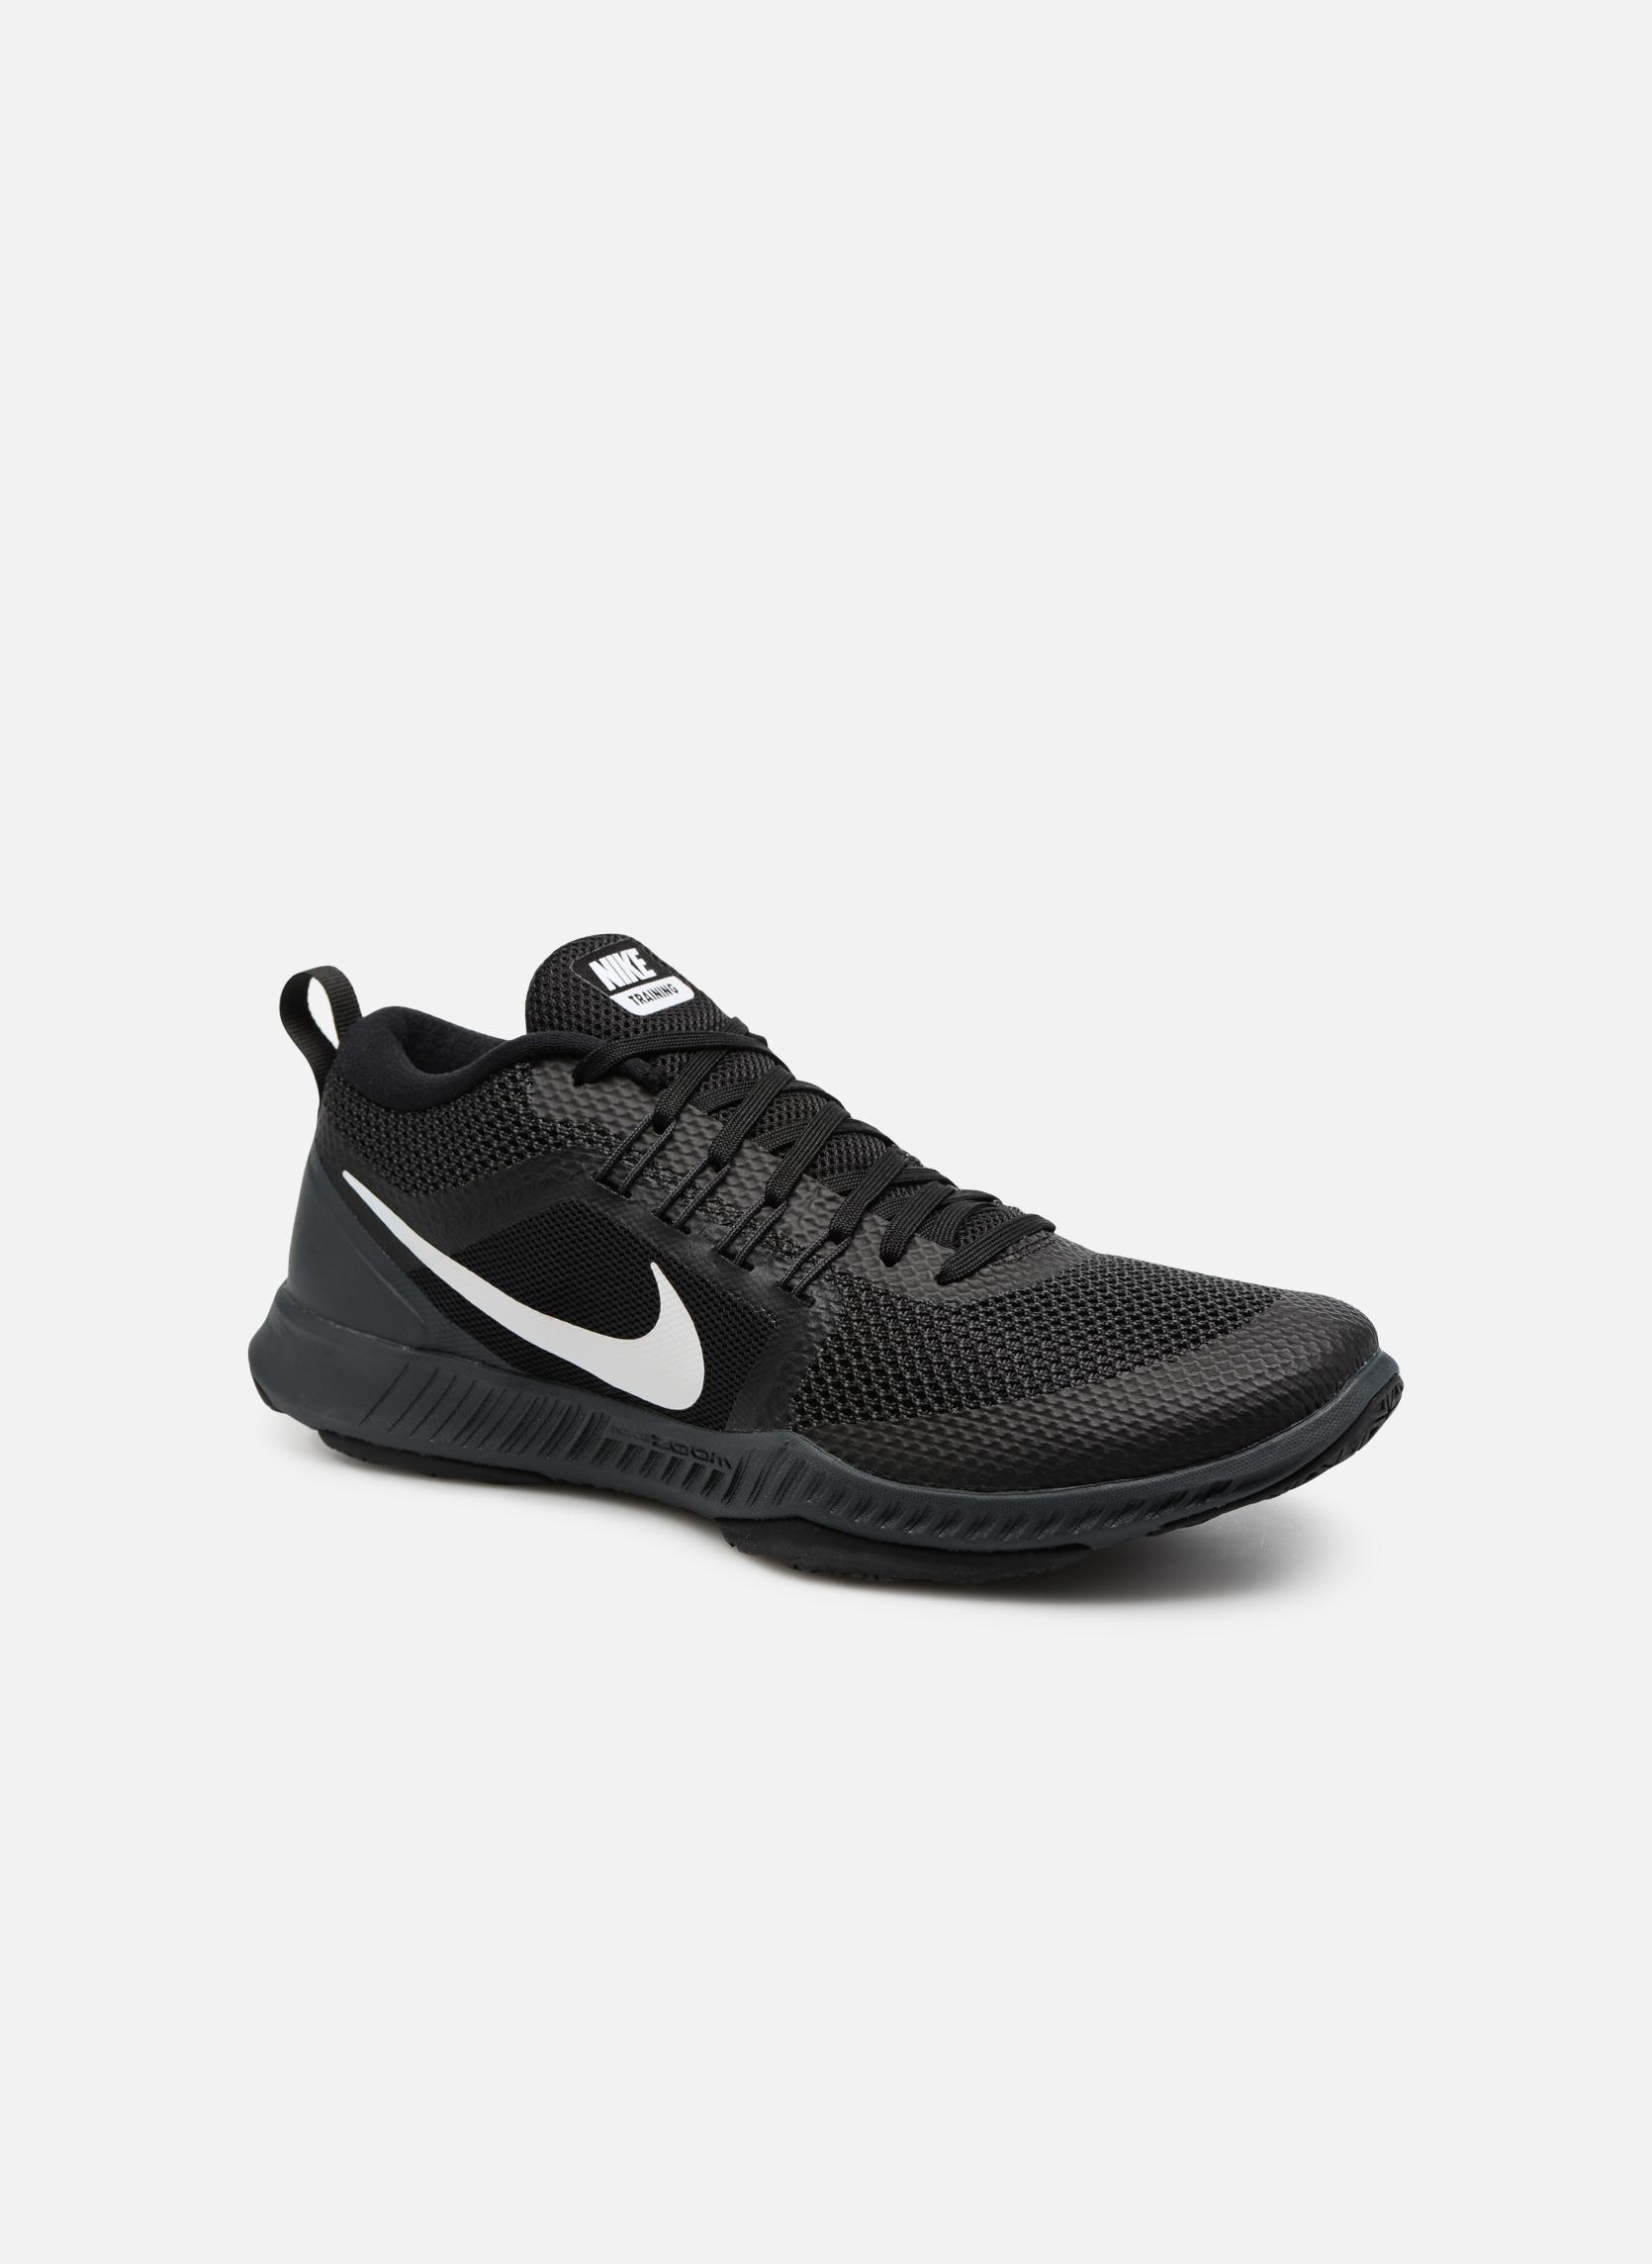 Nike Zoom Domination Tr